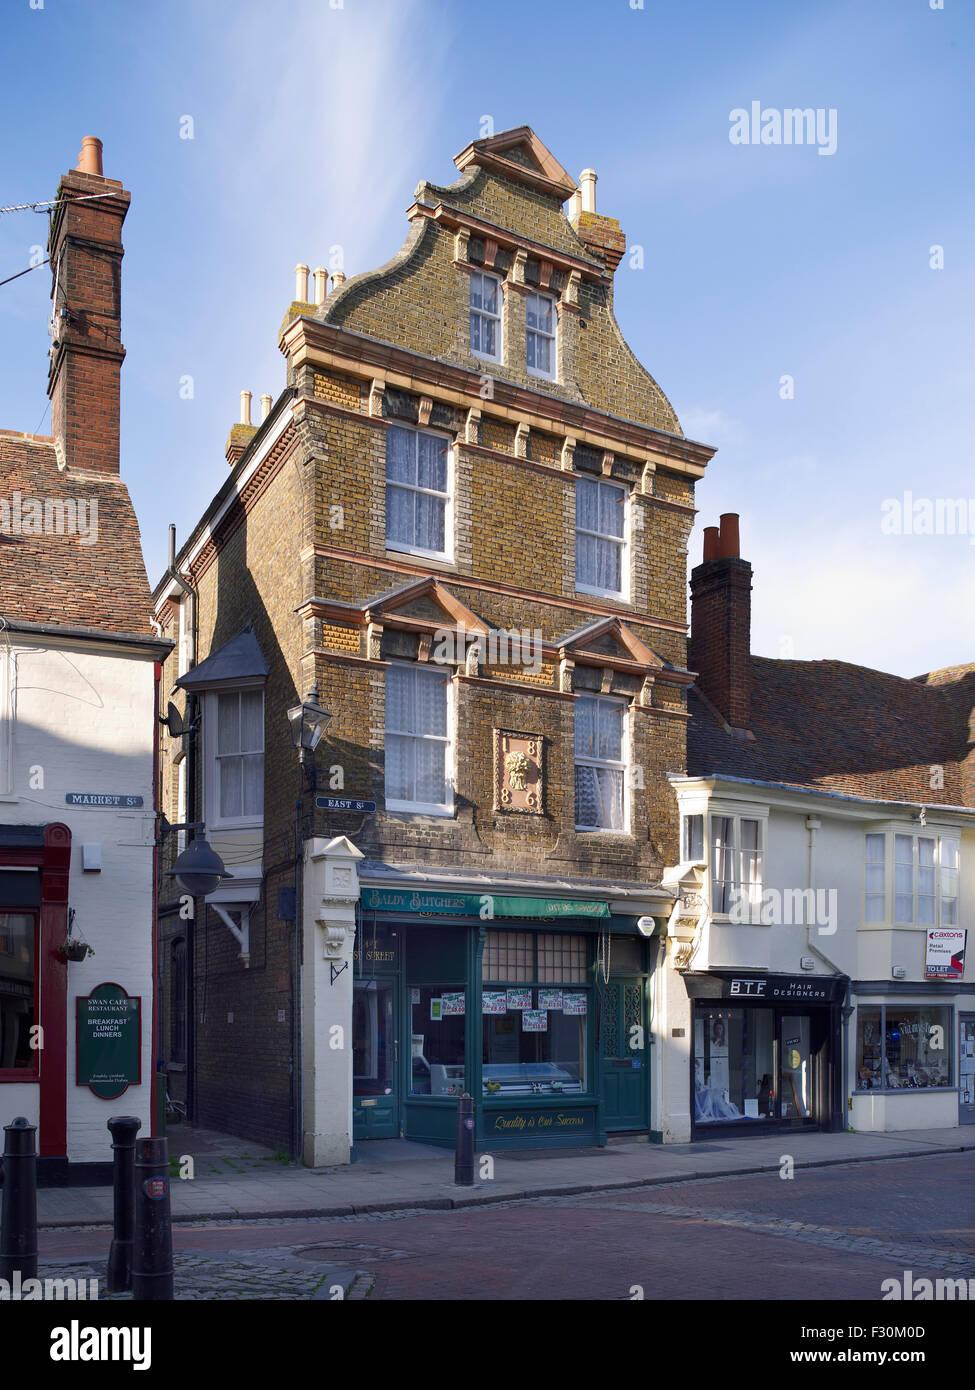 No 1 East Street, Faversham, Kent Stock Photo